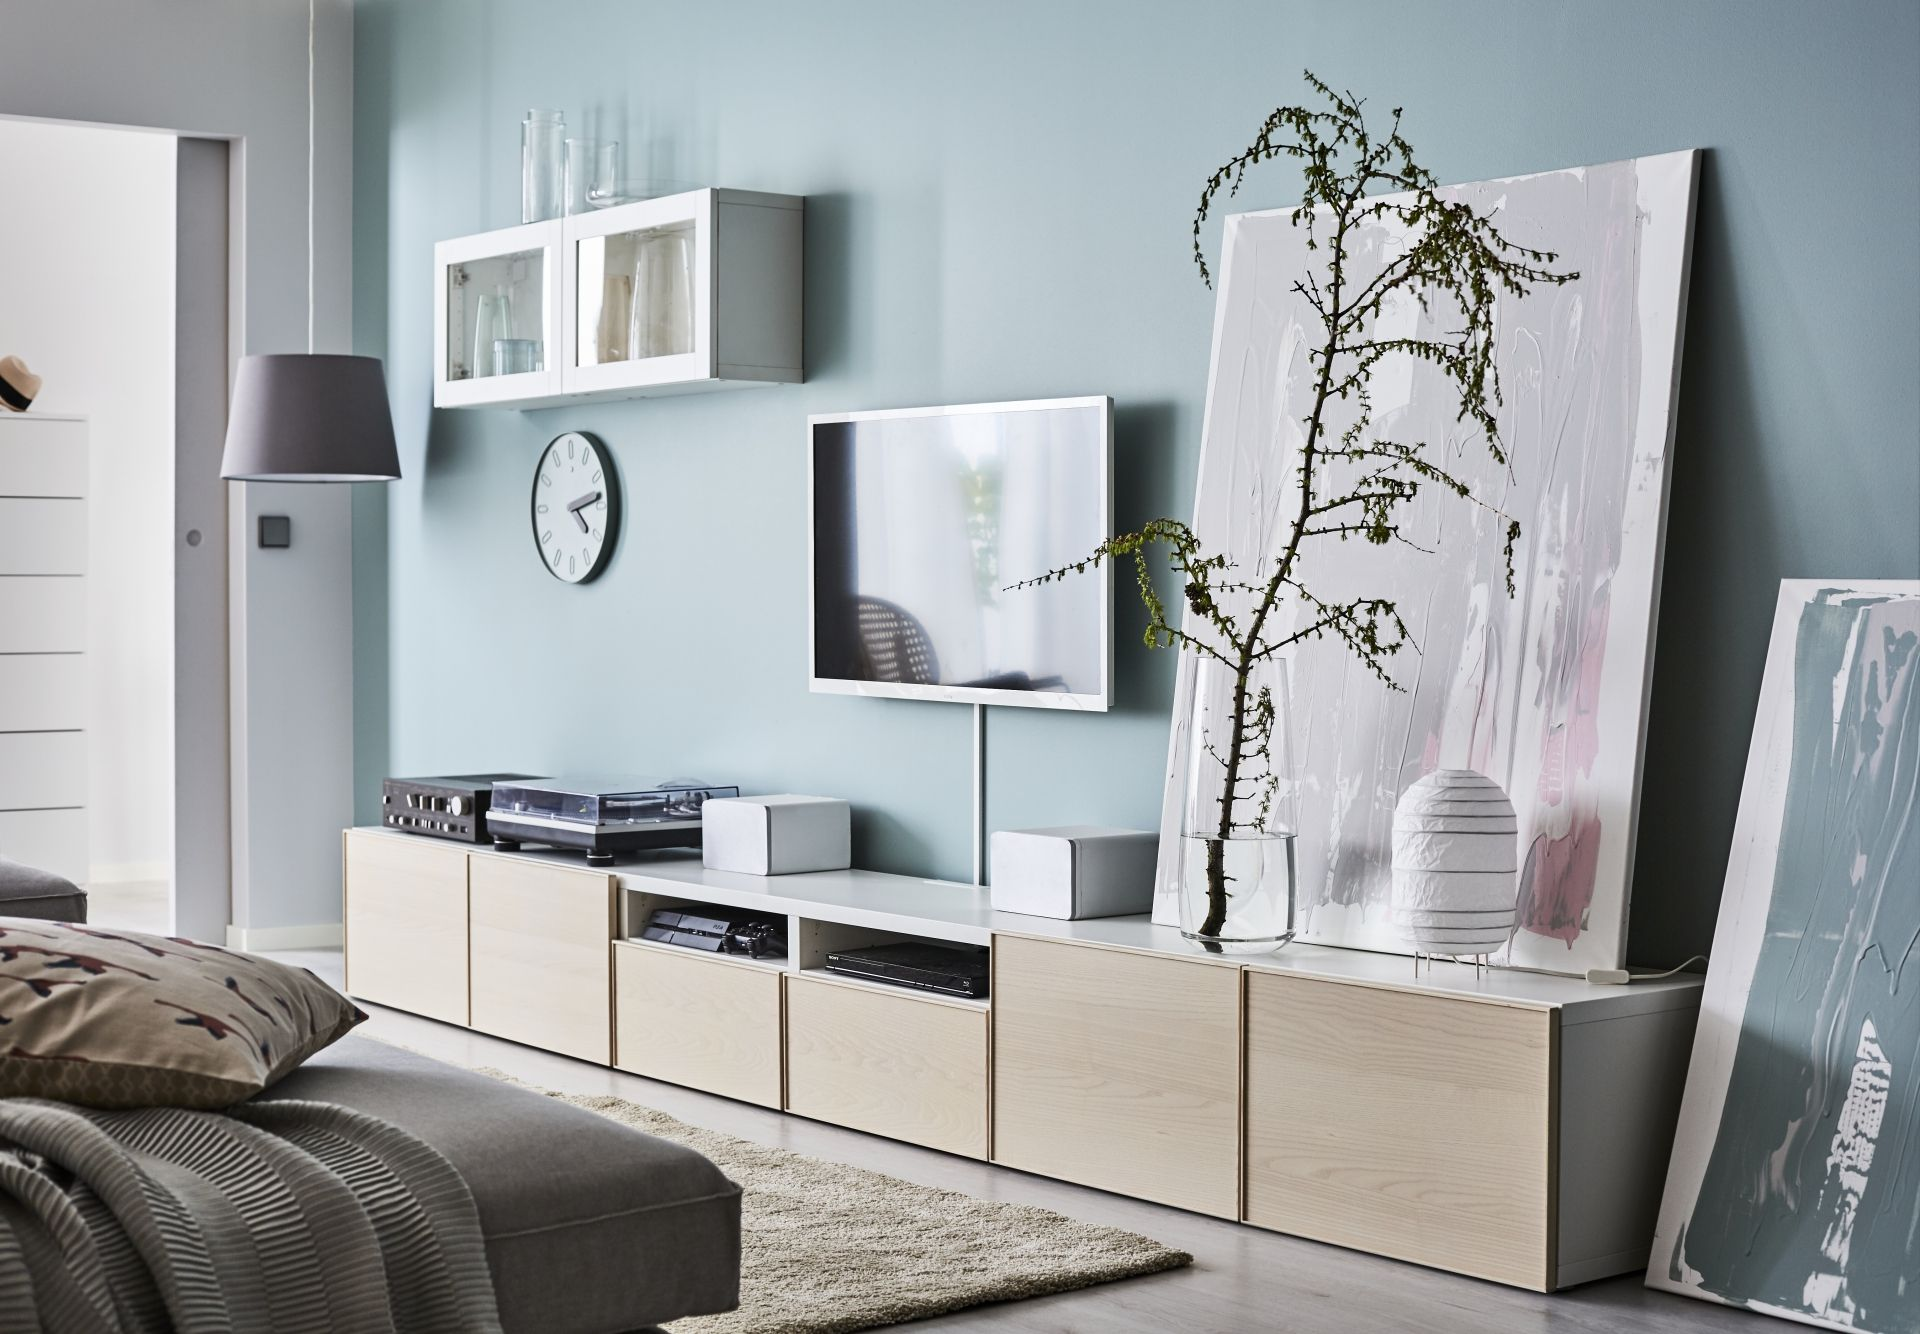 Sal n con muebles bext de ikea en blanco sobre paredes azules salon nuevo pinterest pared - Mueble de salon ikea ...